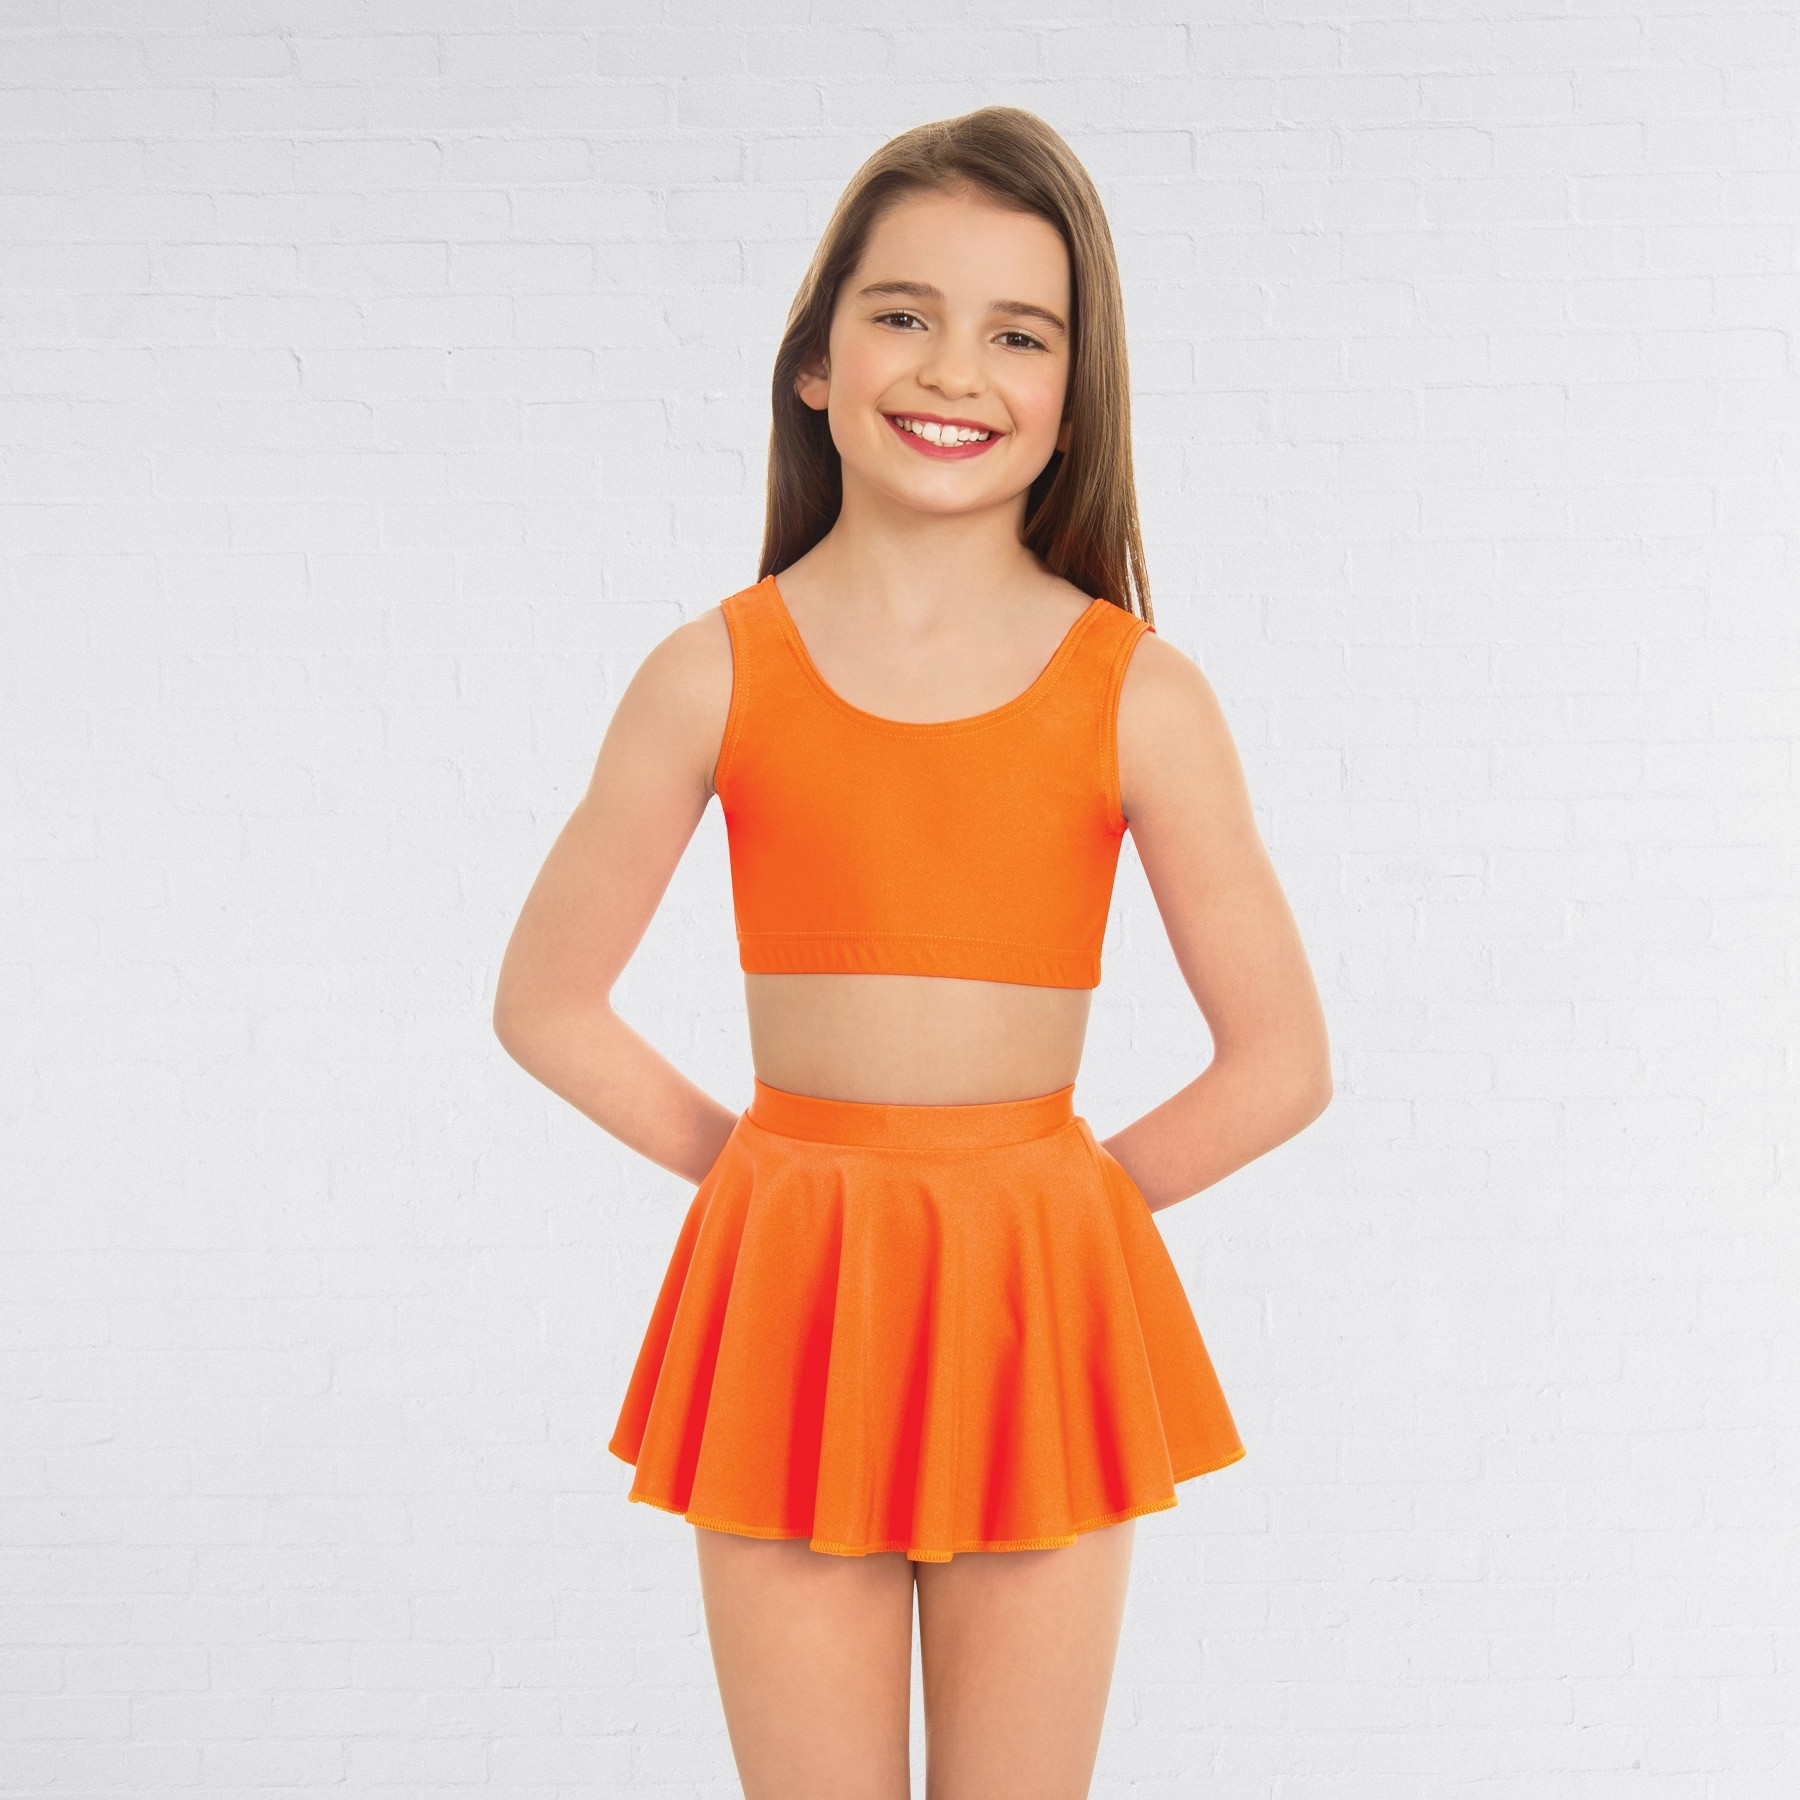 1st Position Circular Skirt (Flo Orange)